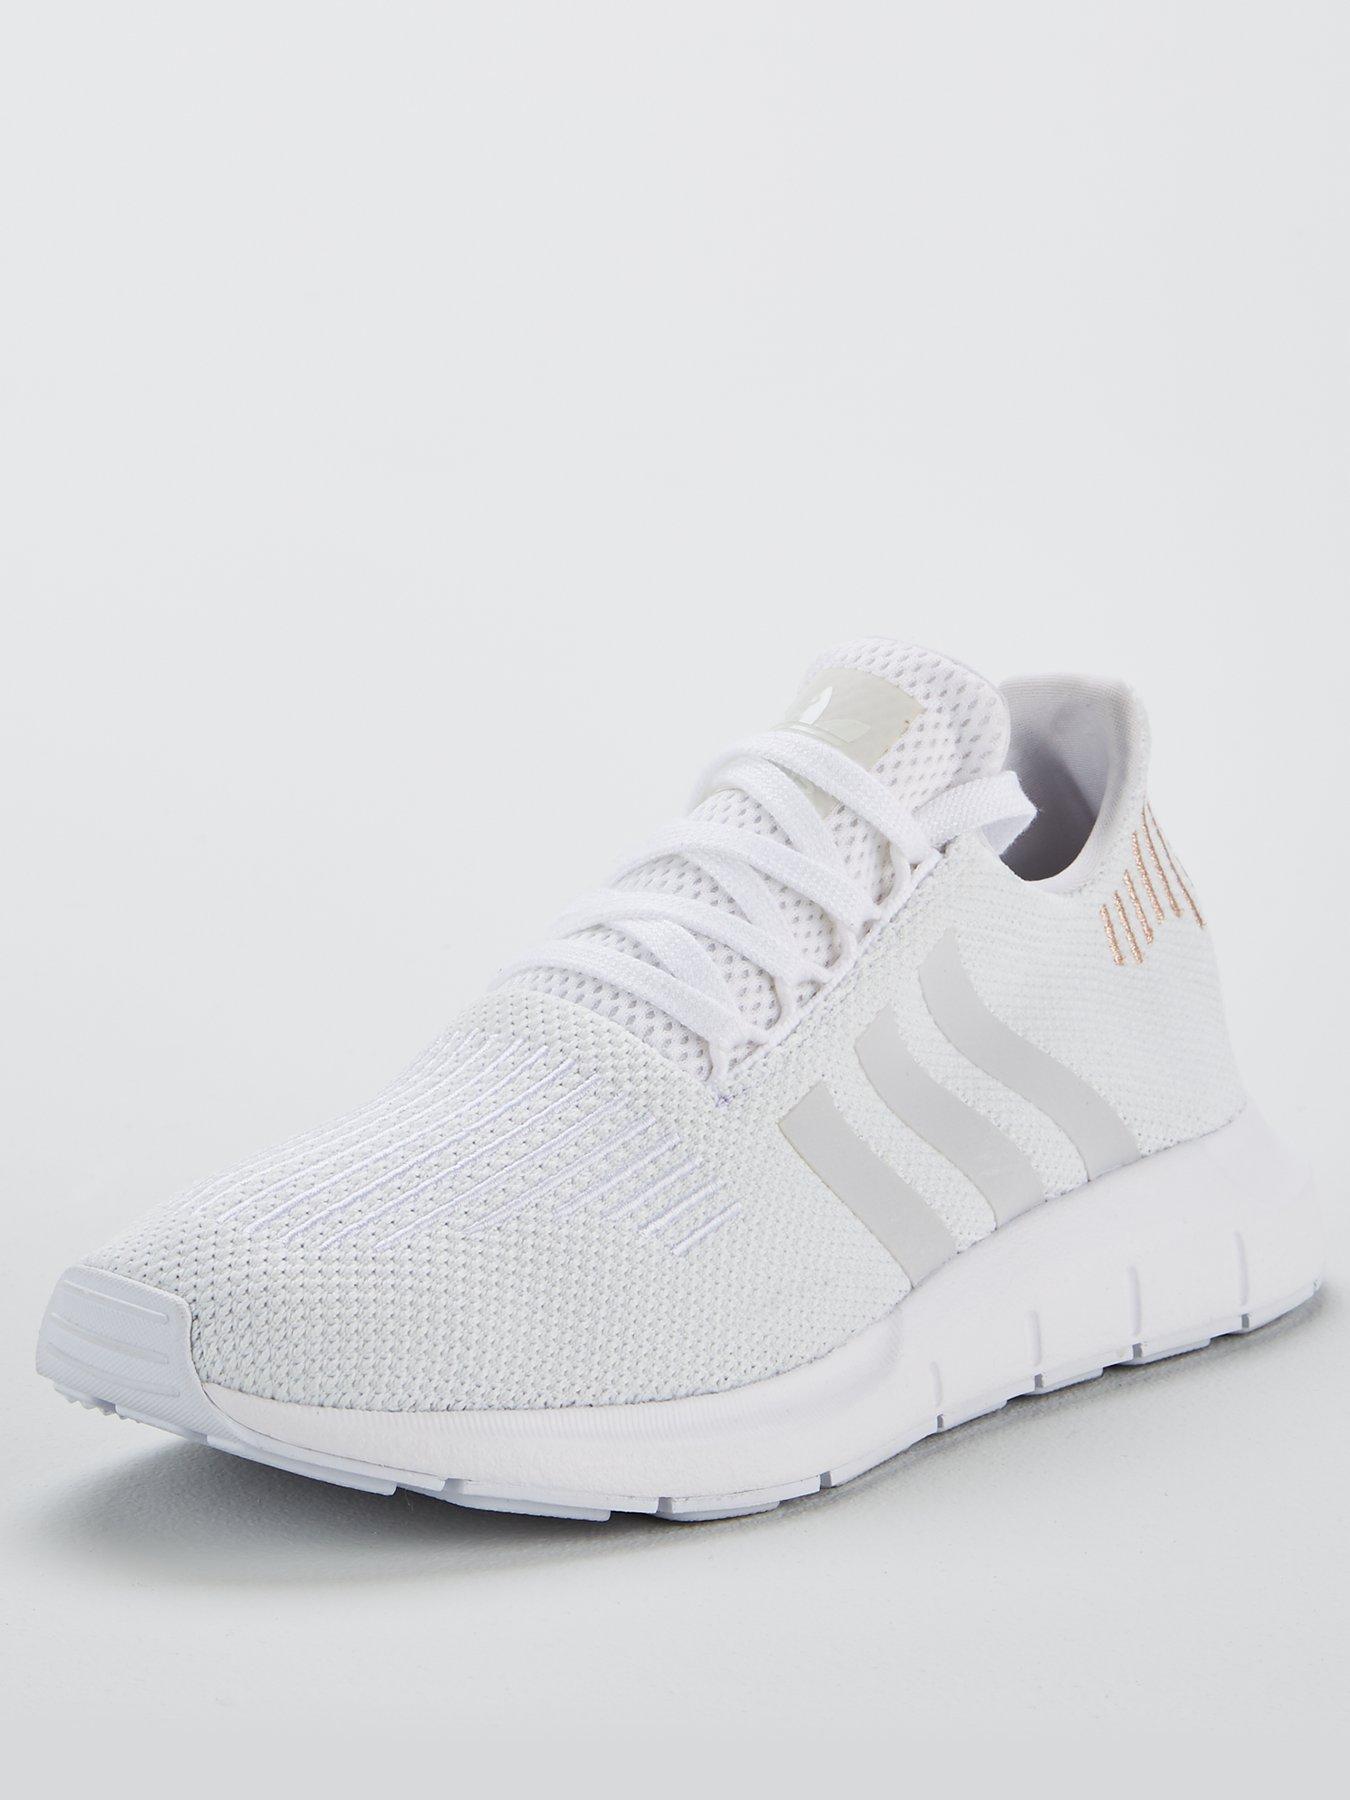 Adidas originali swift run formatori donne